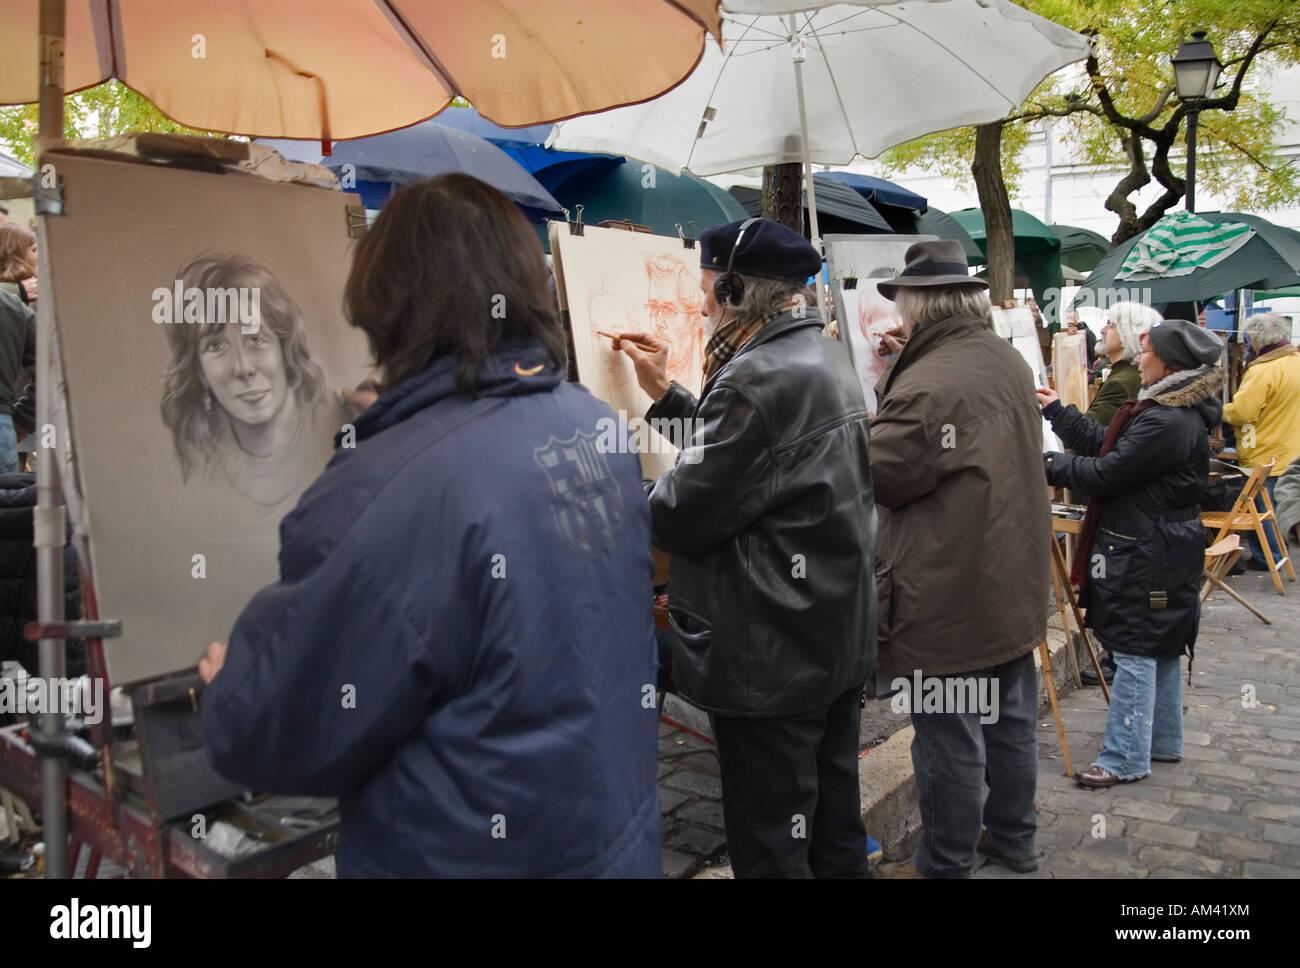 Local street painters at work at Place du Tertre Montmartre Paris France - Stock Image